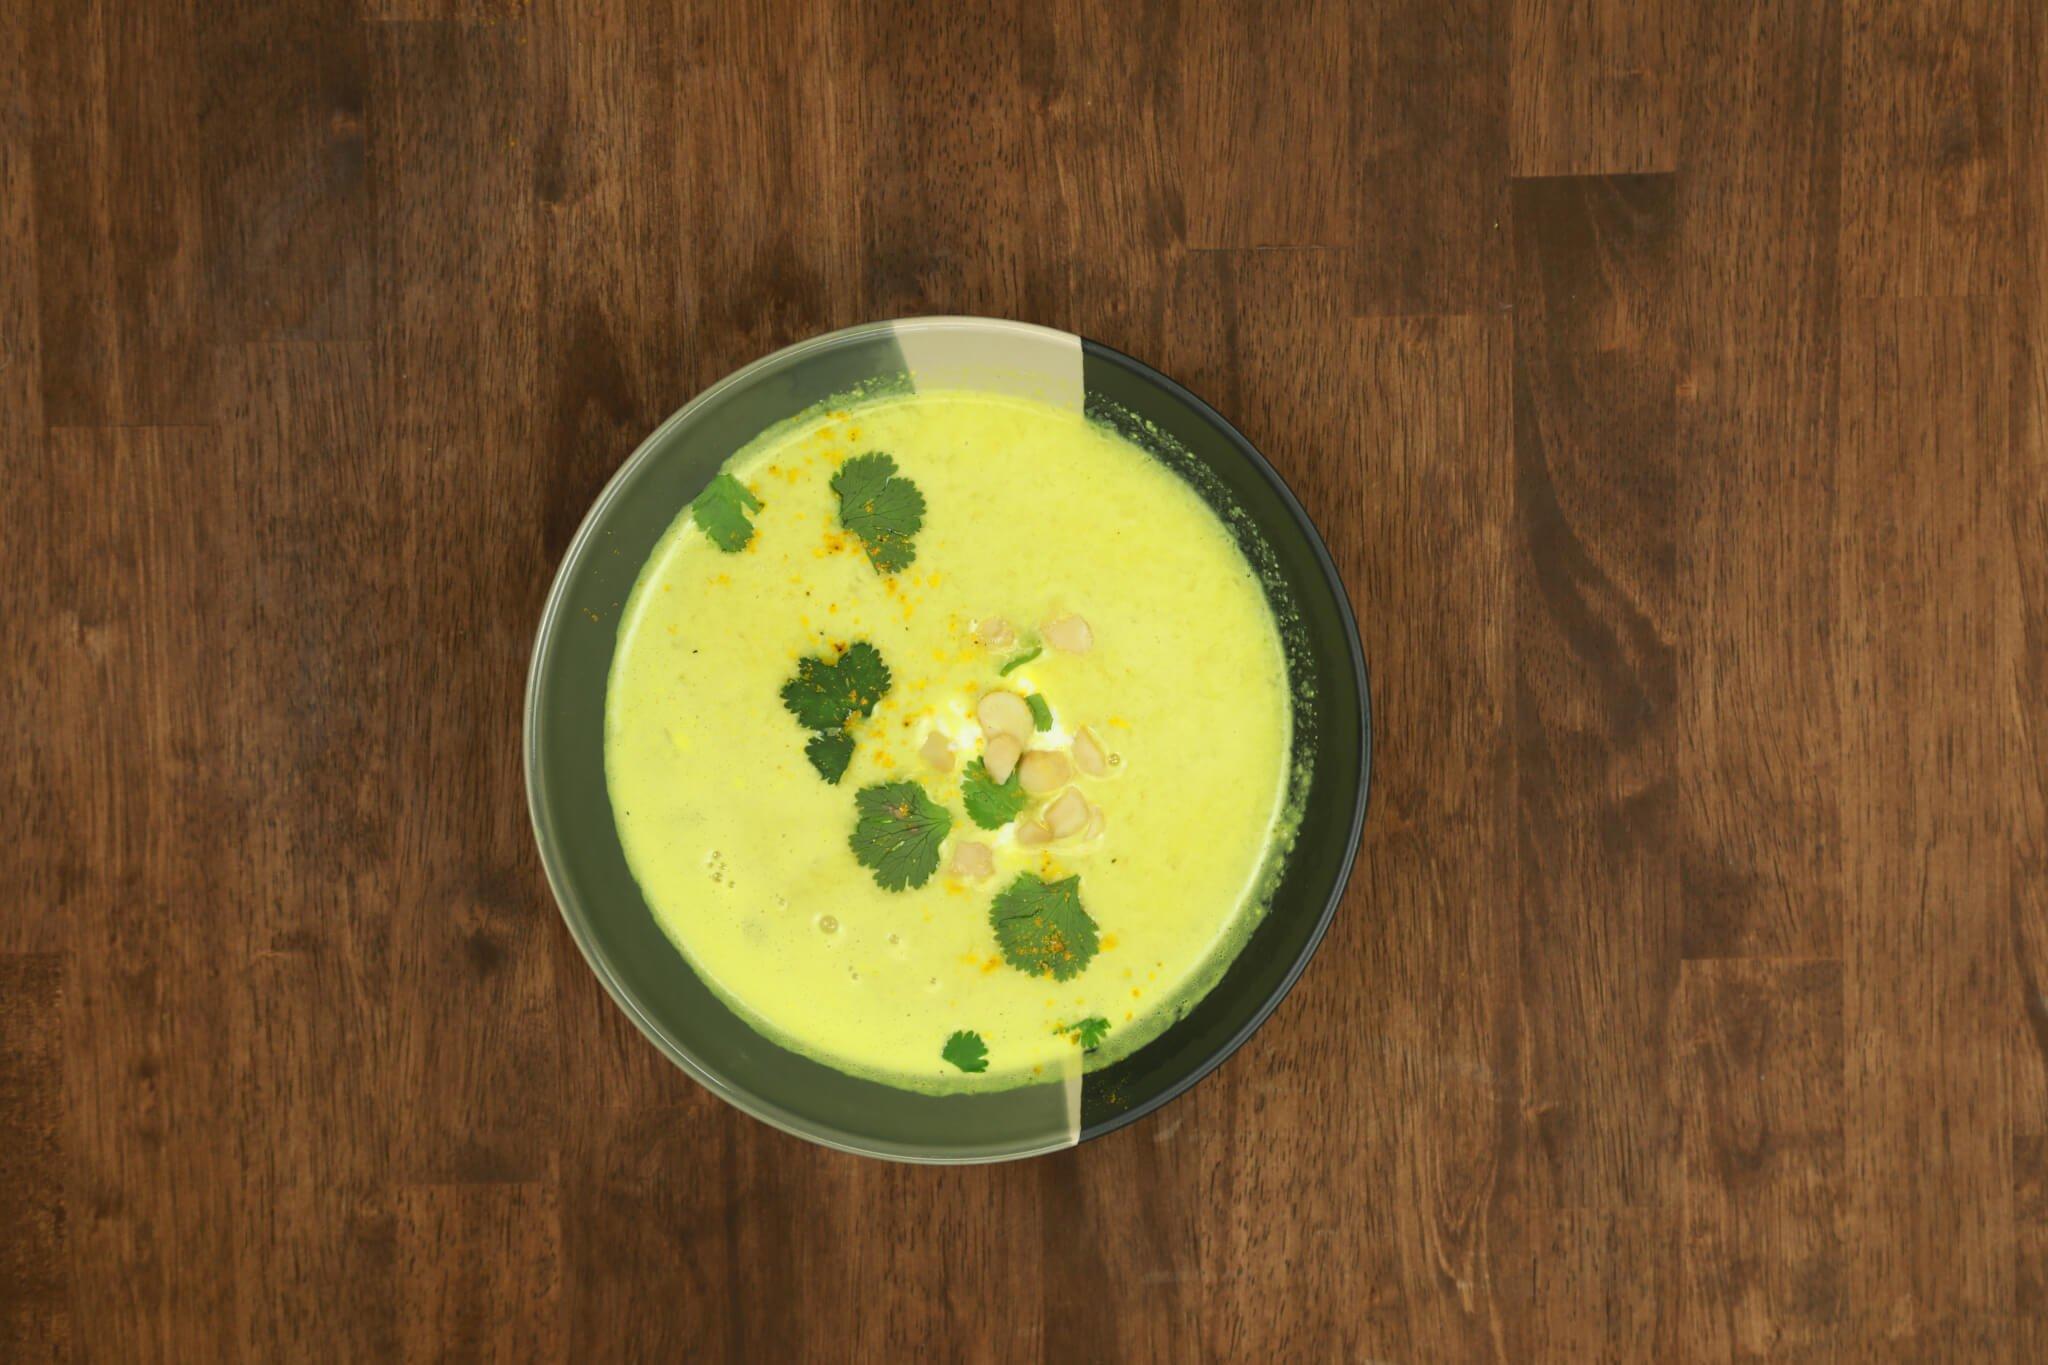 Dr. Gundry's Vegan Curry Cauliflower Soup Recipe